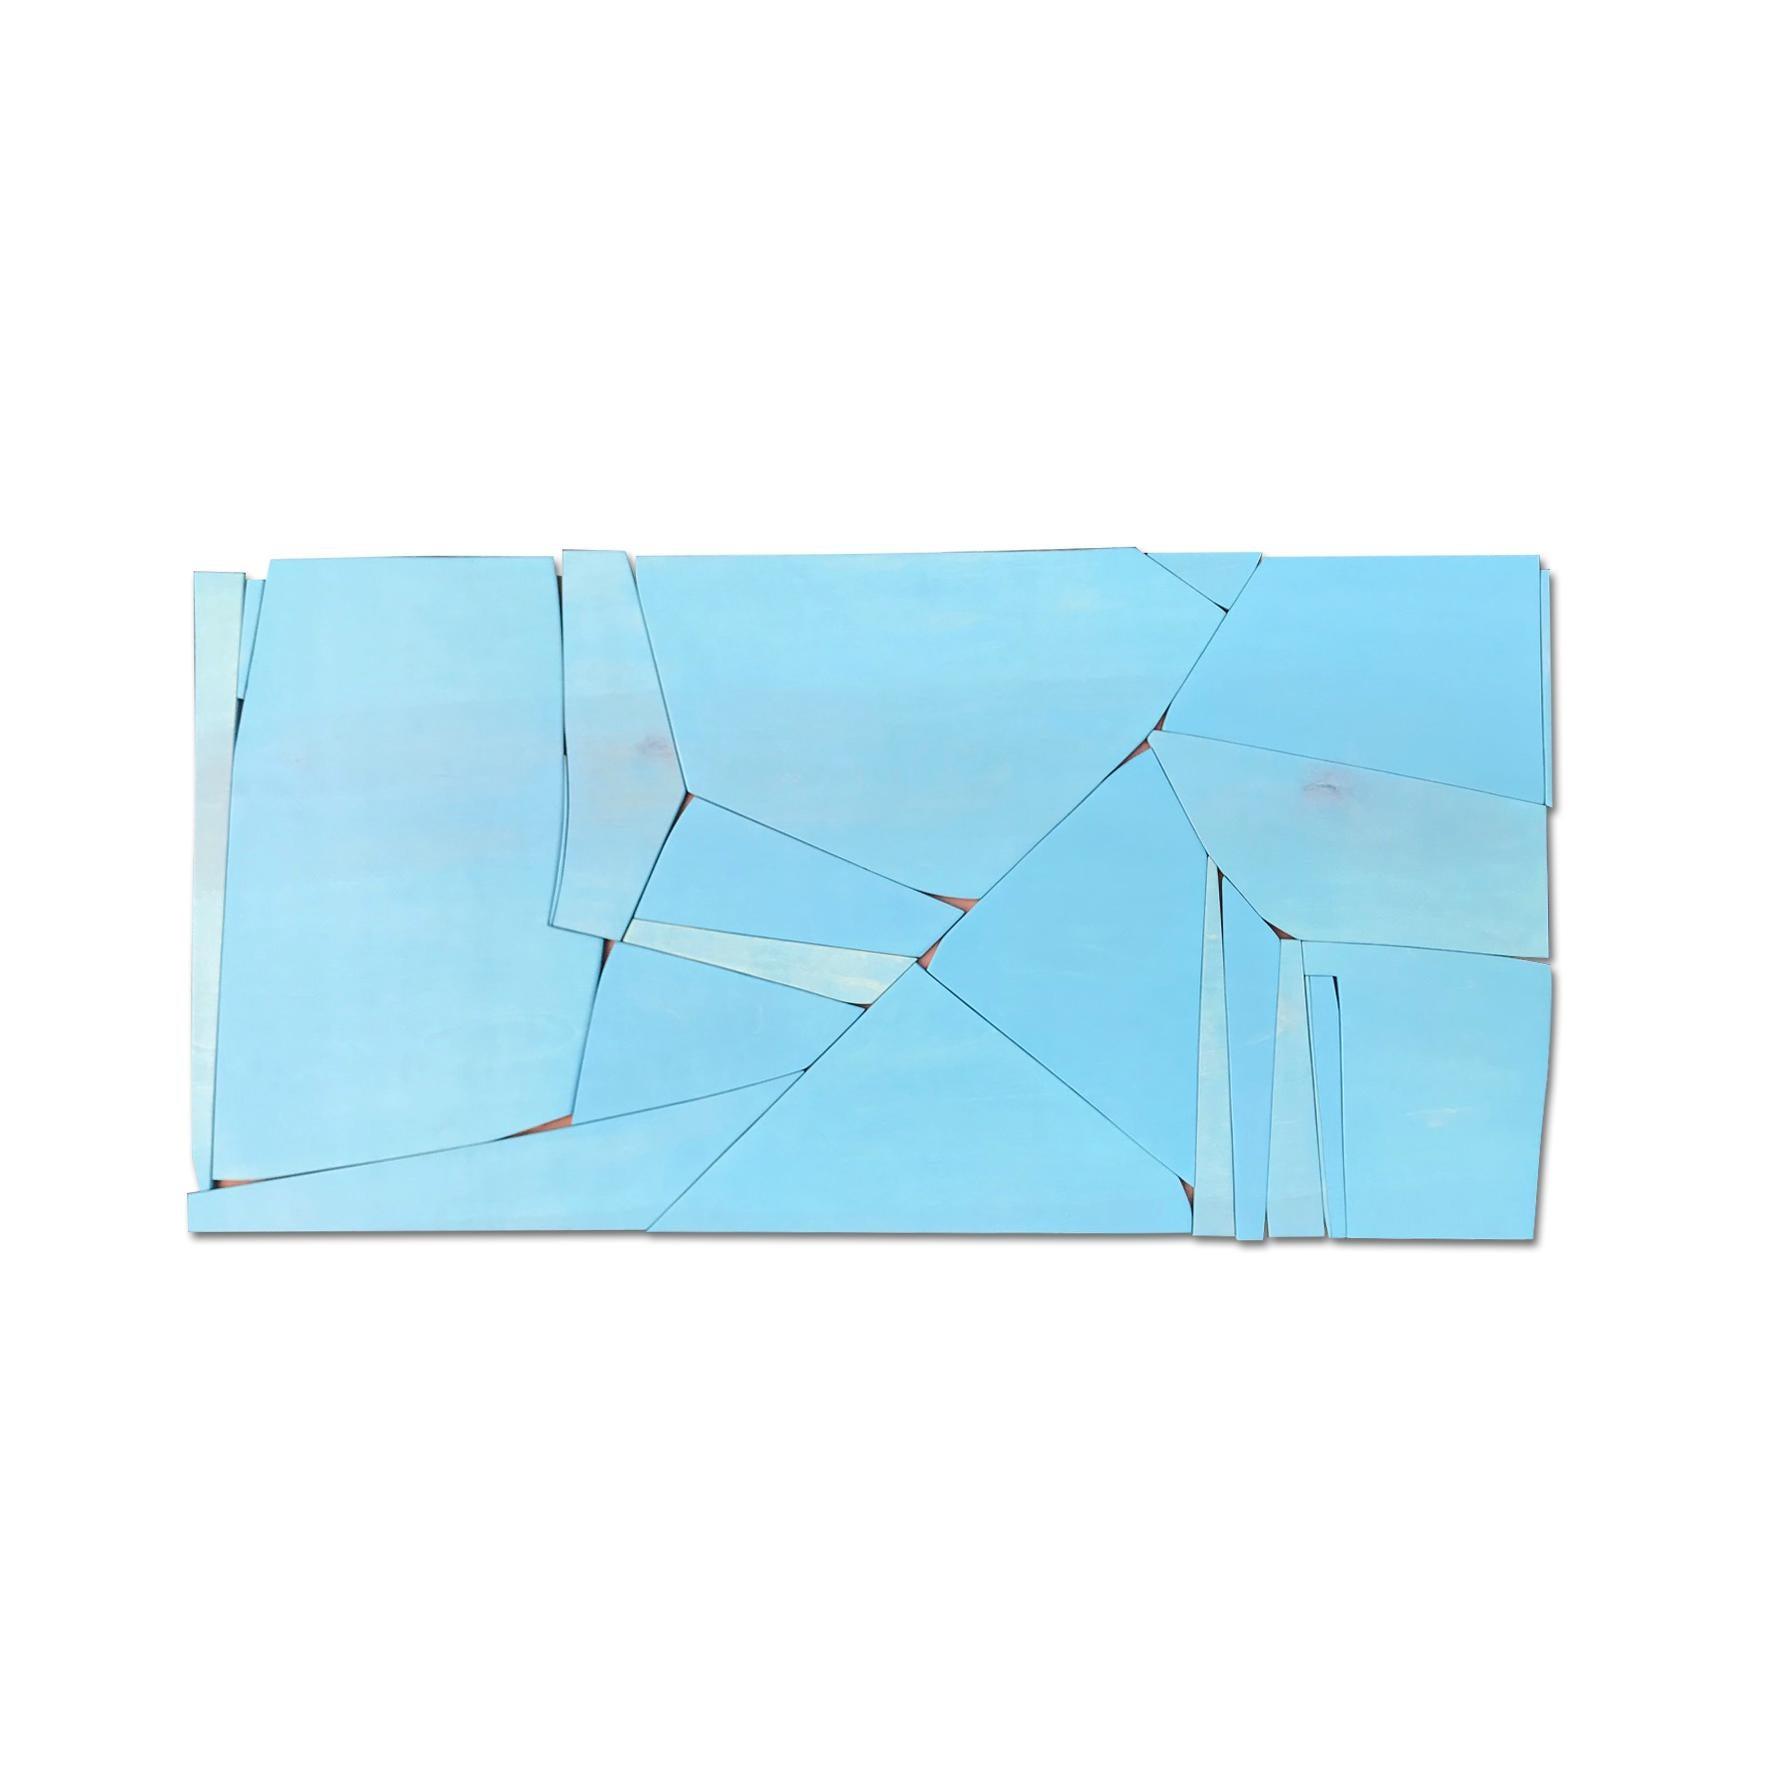 BlueTwo (modern abstract wall sculpture minimal geometric design blue wood art)